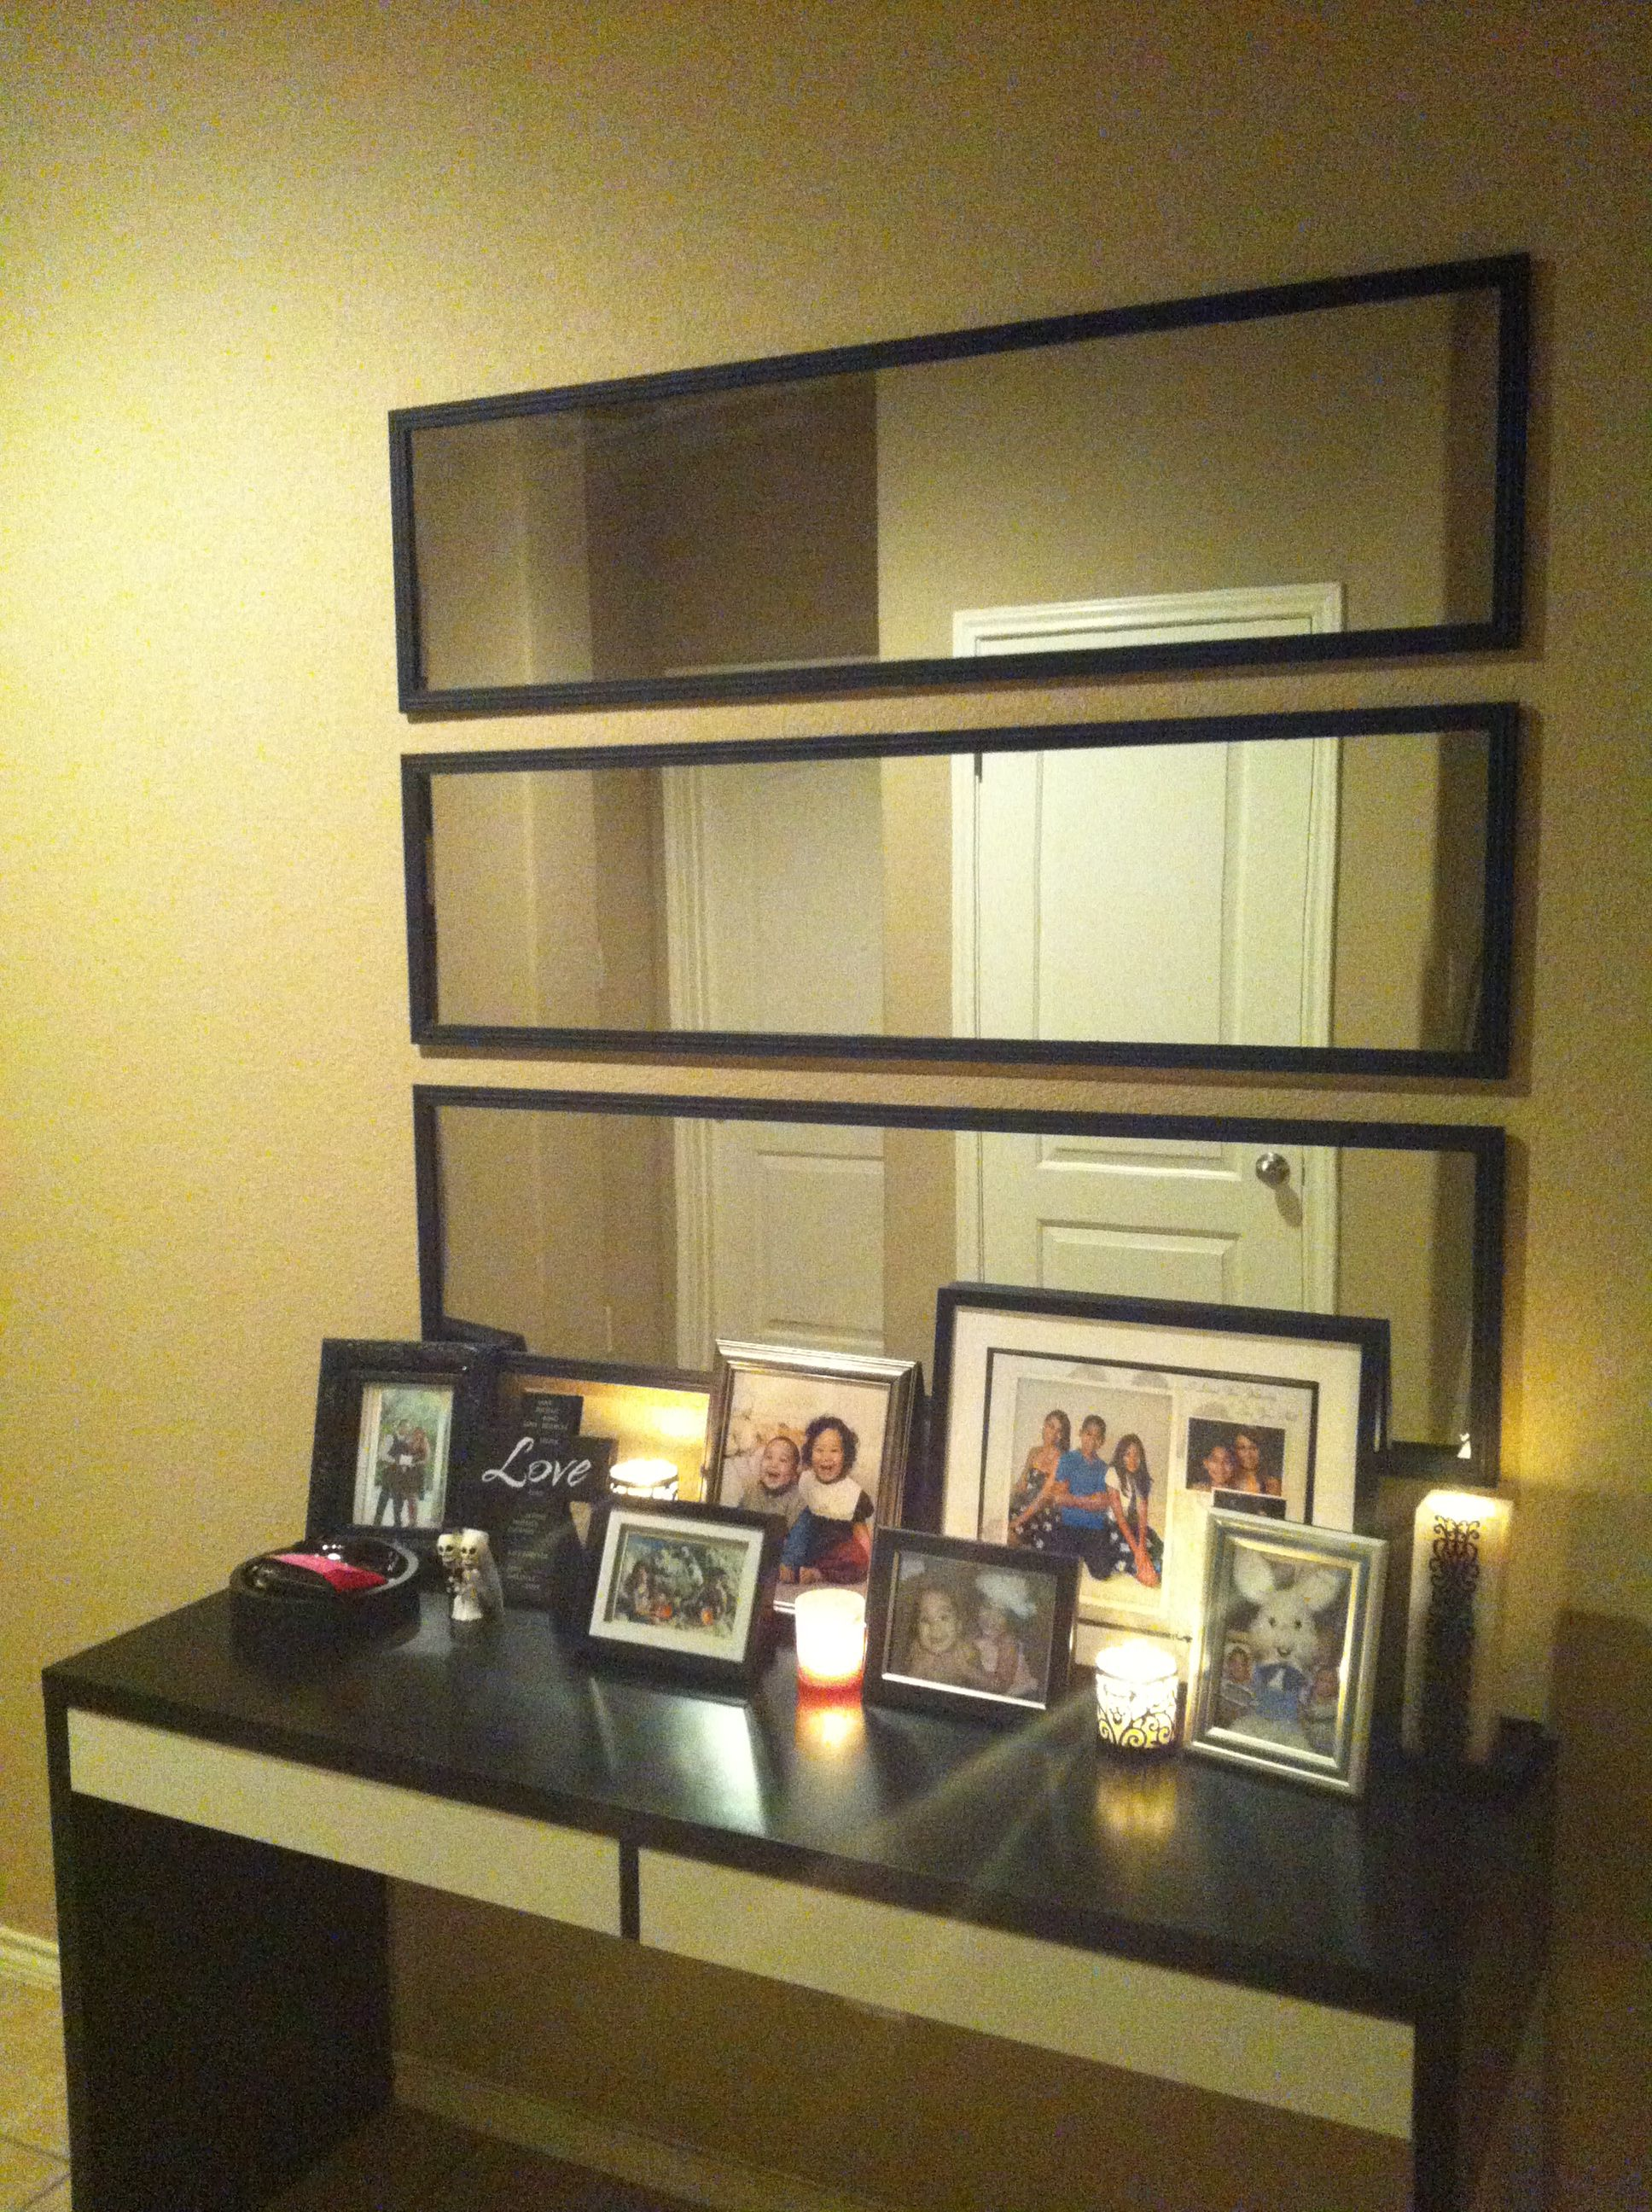 Got 3 long cheap walmart mirrors and hung them horizontally got 3 long cheap walmart mirrors and hung them horizontally thank you pintetest amipublicfo Gallery